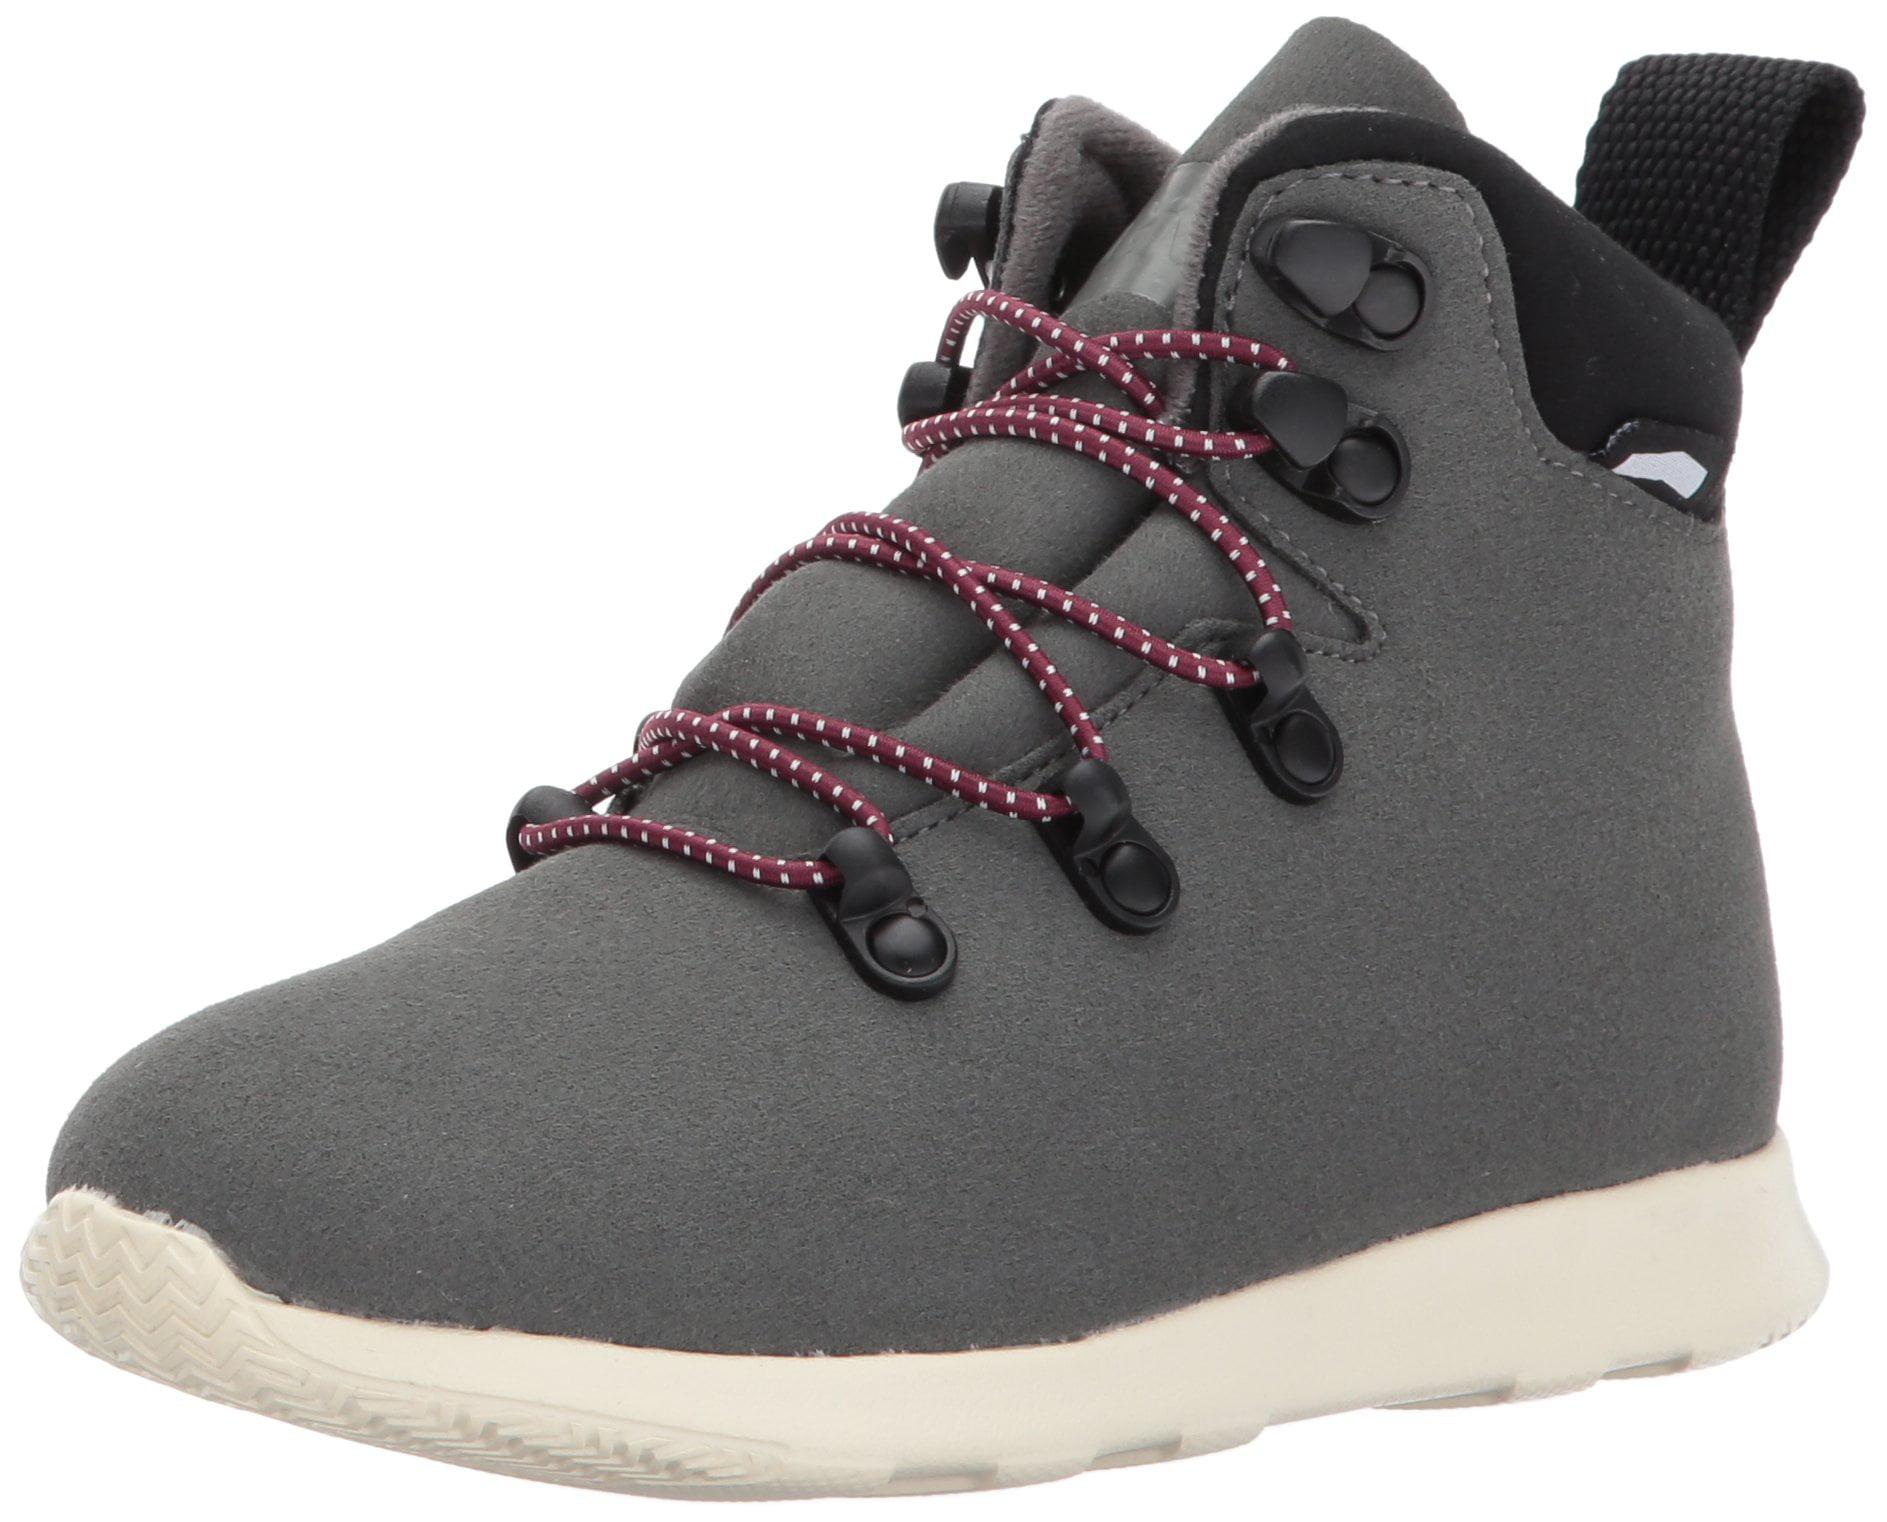 Native 42103600-1248 : Unisex-Kids AP Apex Junior Hiking Boot by